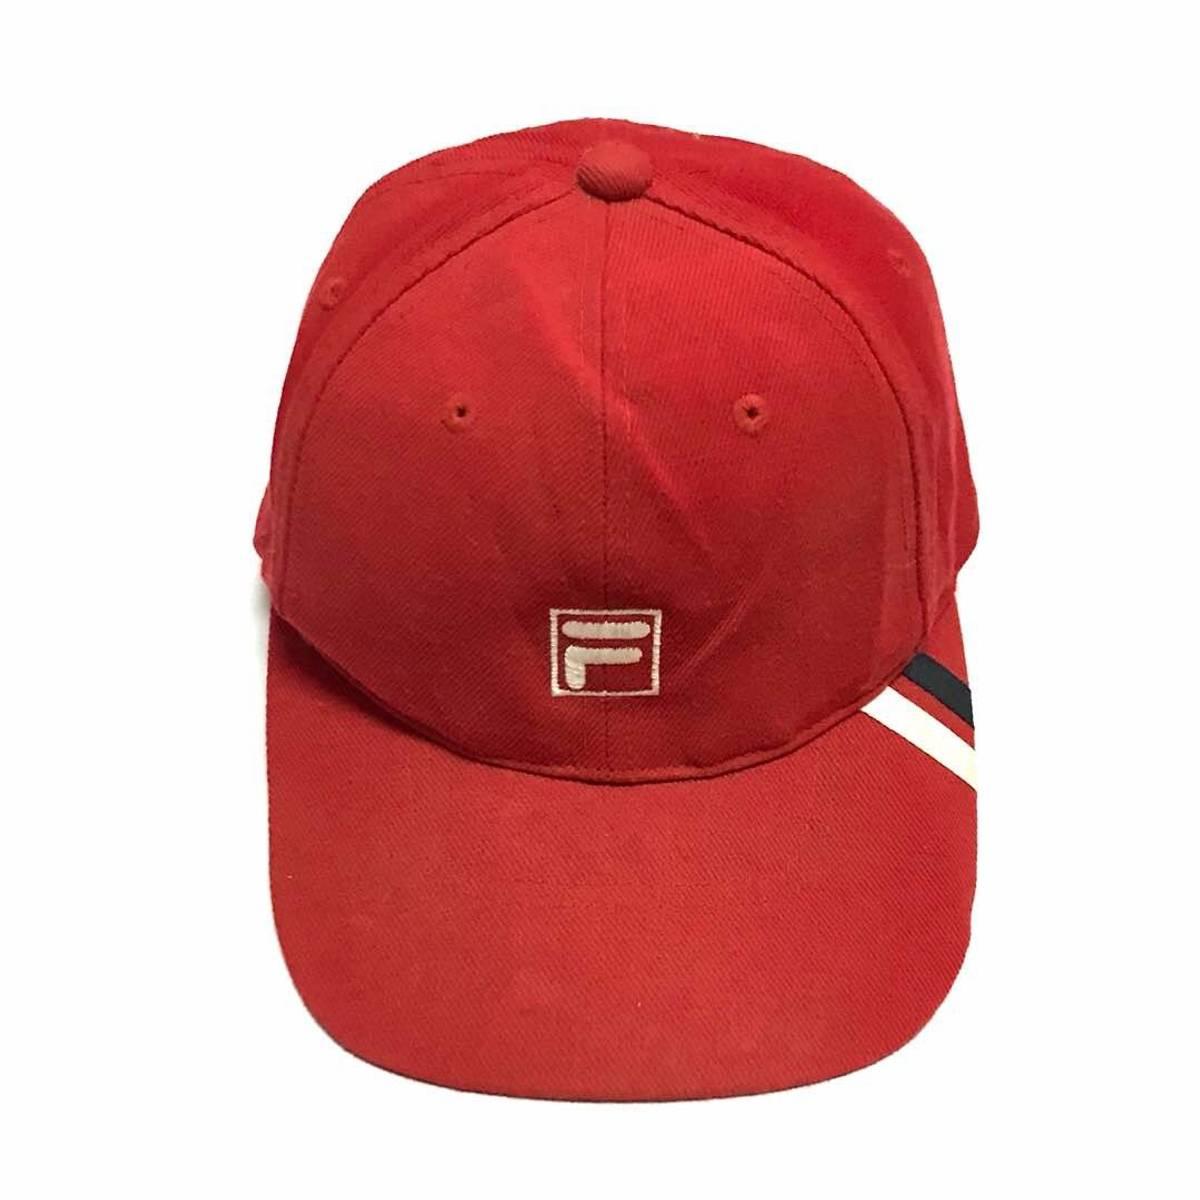 Fila Rare!! Vintage Fila Baseball Cap Snapback One Size Fits All ... 029a8b2b029